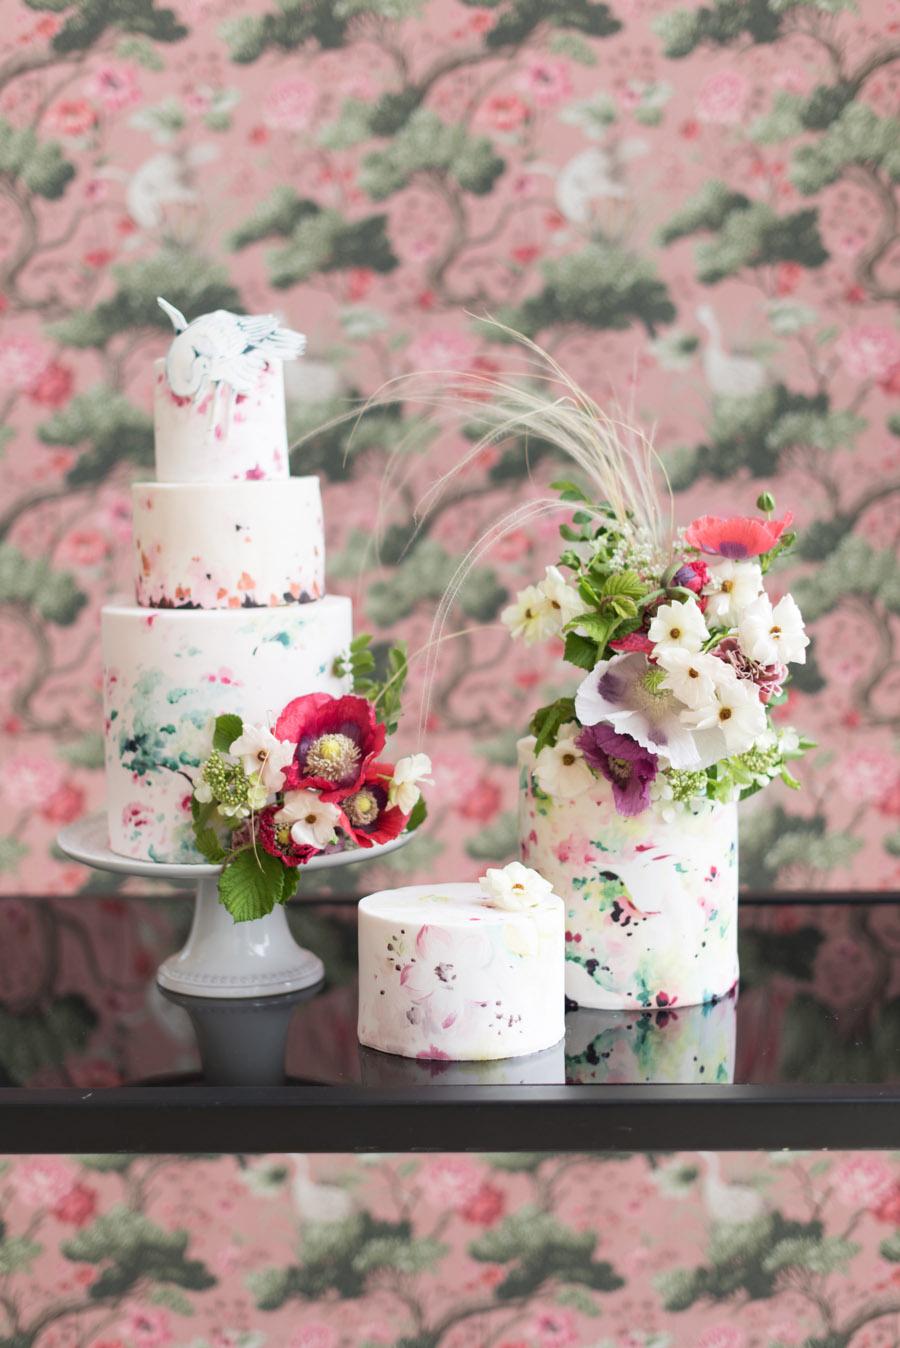 floral wedding ideas at Millbridge Court on English Wedding - photo credit Julie Michaelsen Photography (28)